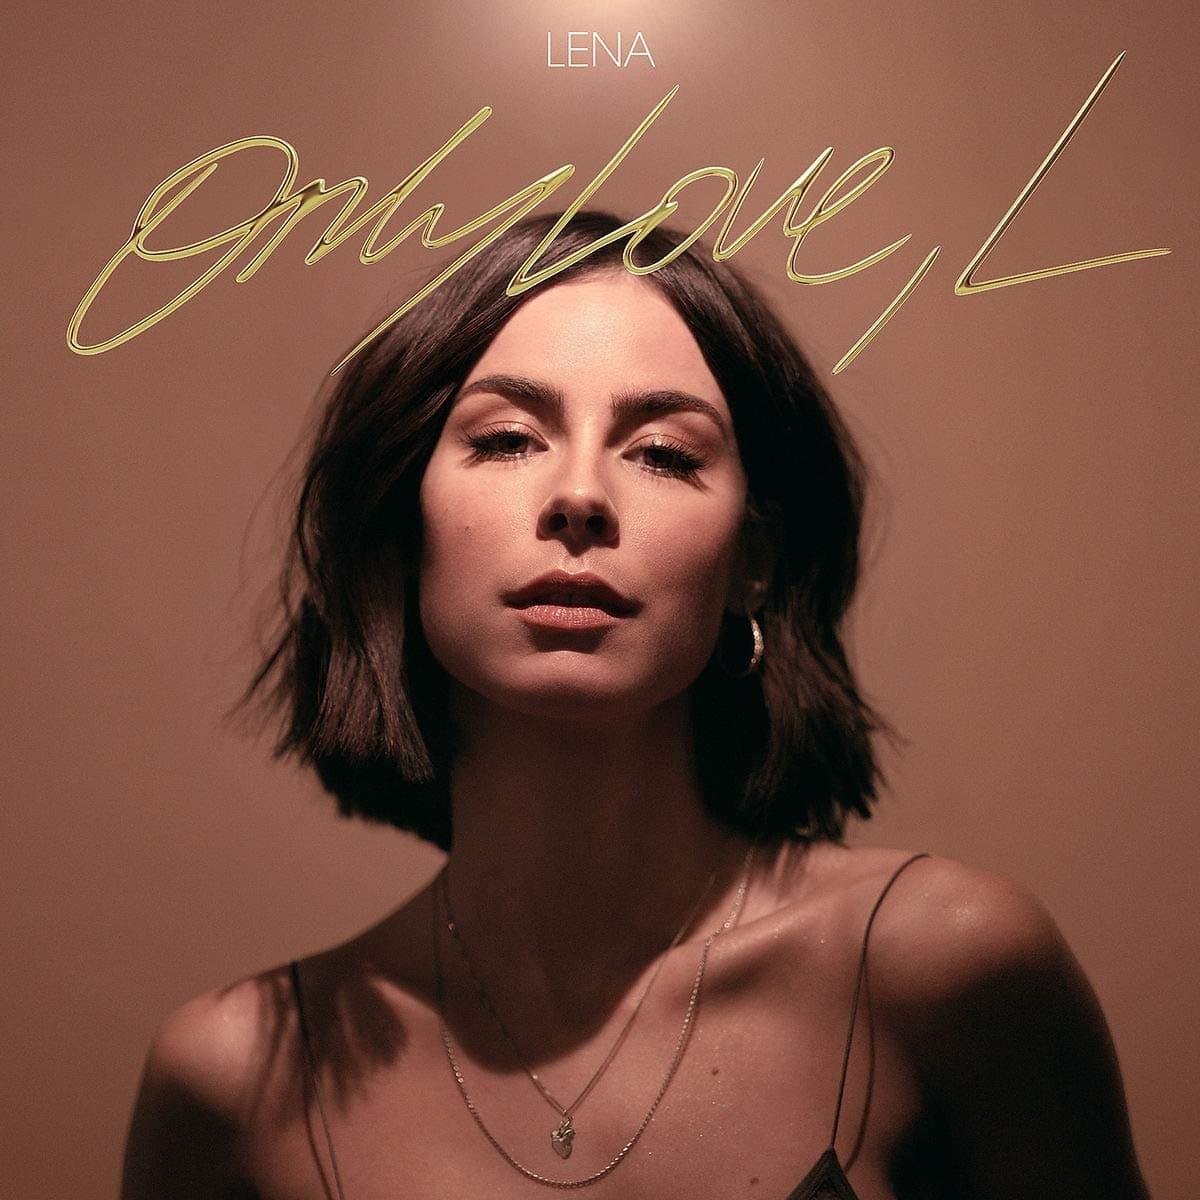 Lena - Neues Album Only Love, L 2019